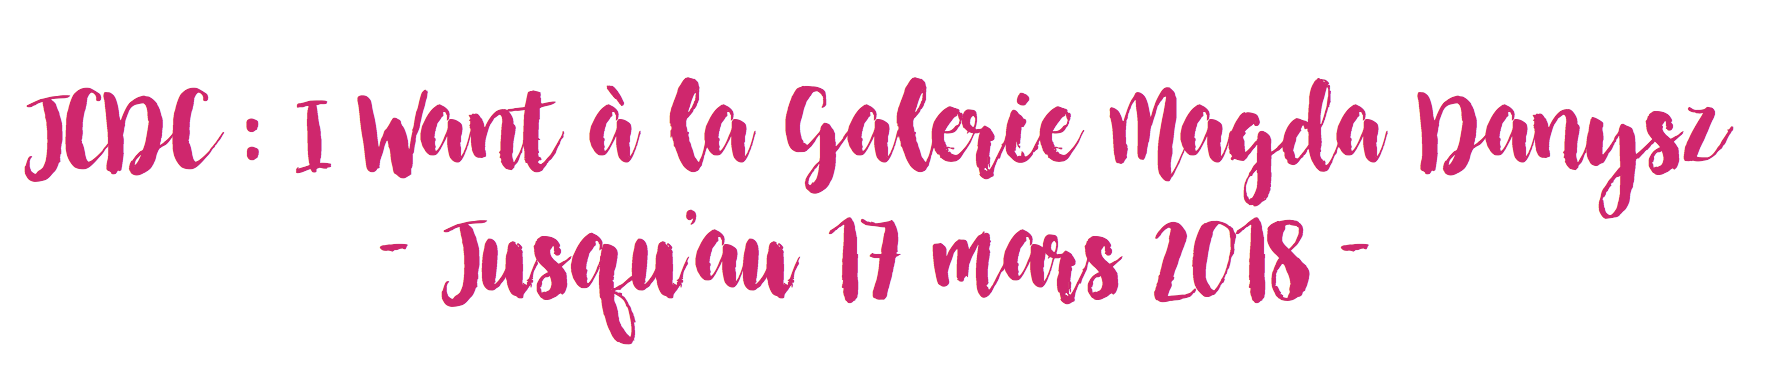 JCDC : I Want - Galerie Magda Danysz